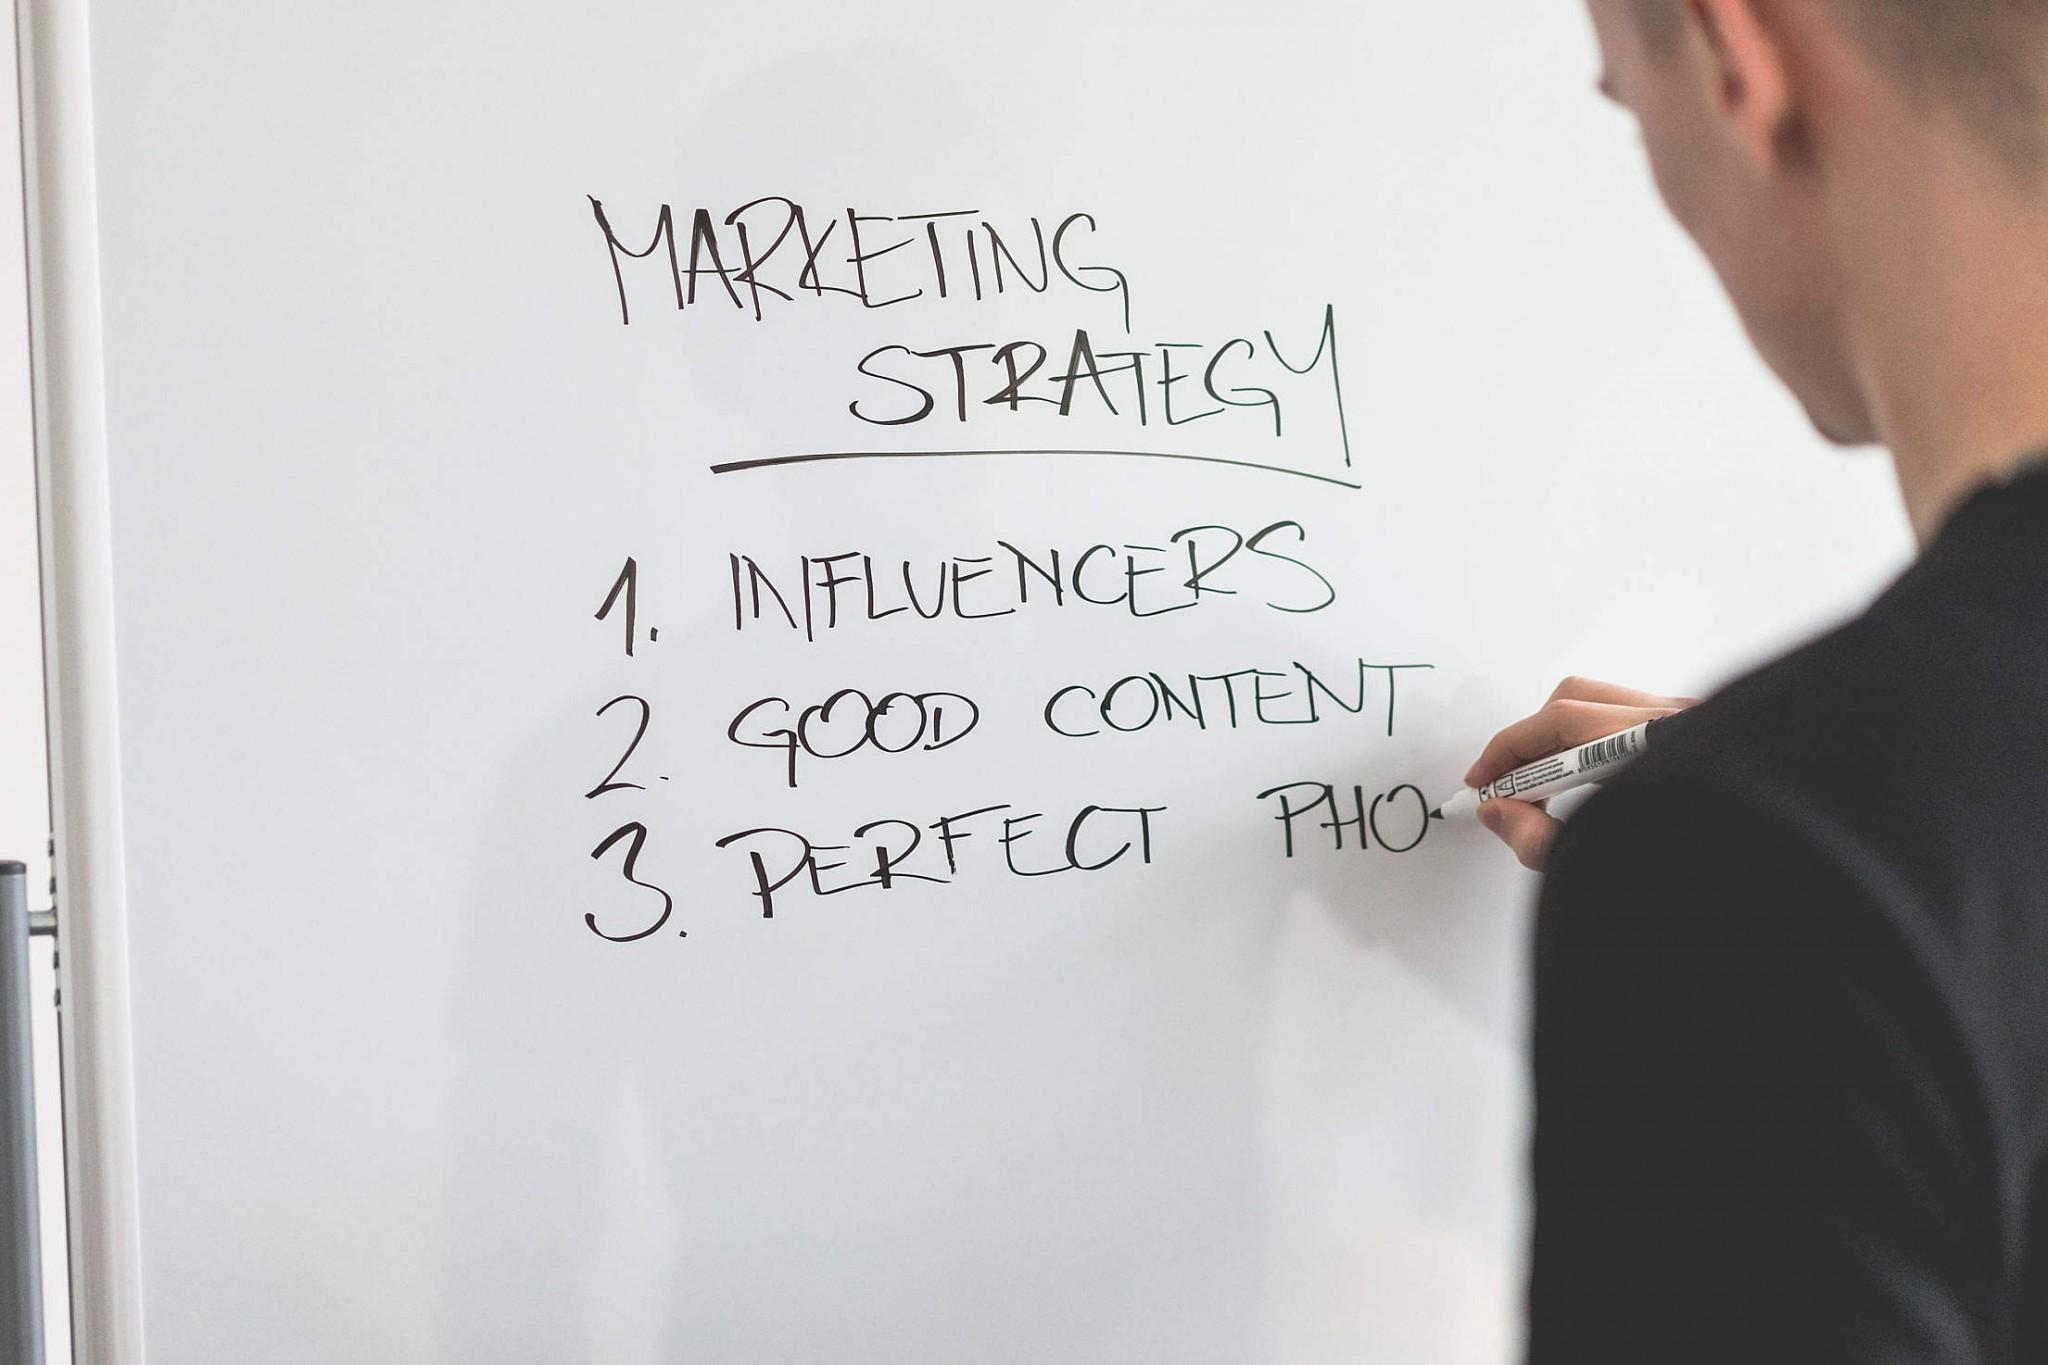 marketing-expert-writing-new-marketing-strategy-on-whiteboard_free_stock_photos_picjumbo_DSC03811-2210x1474